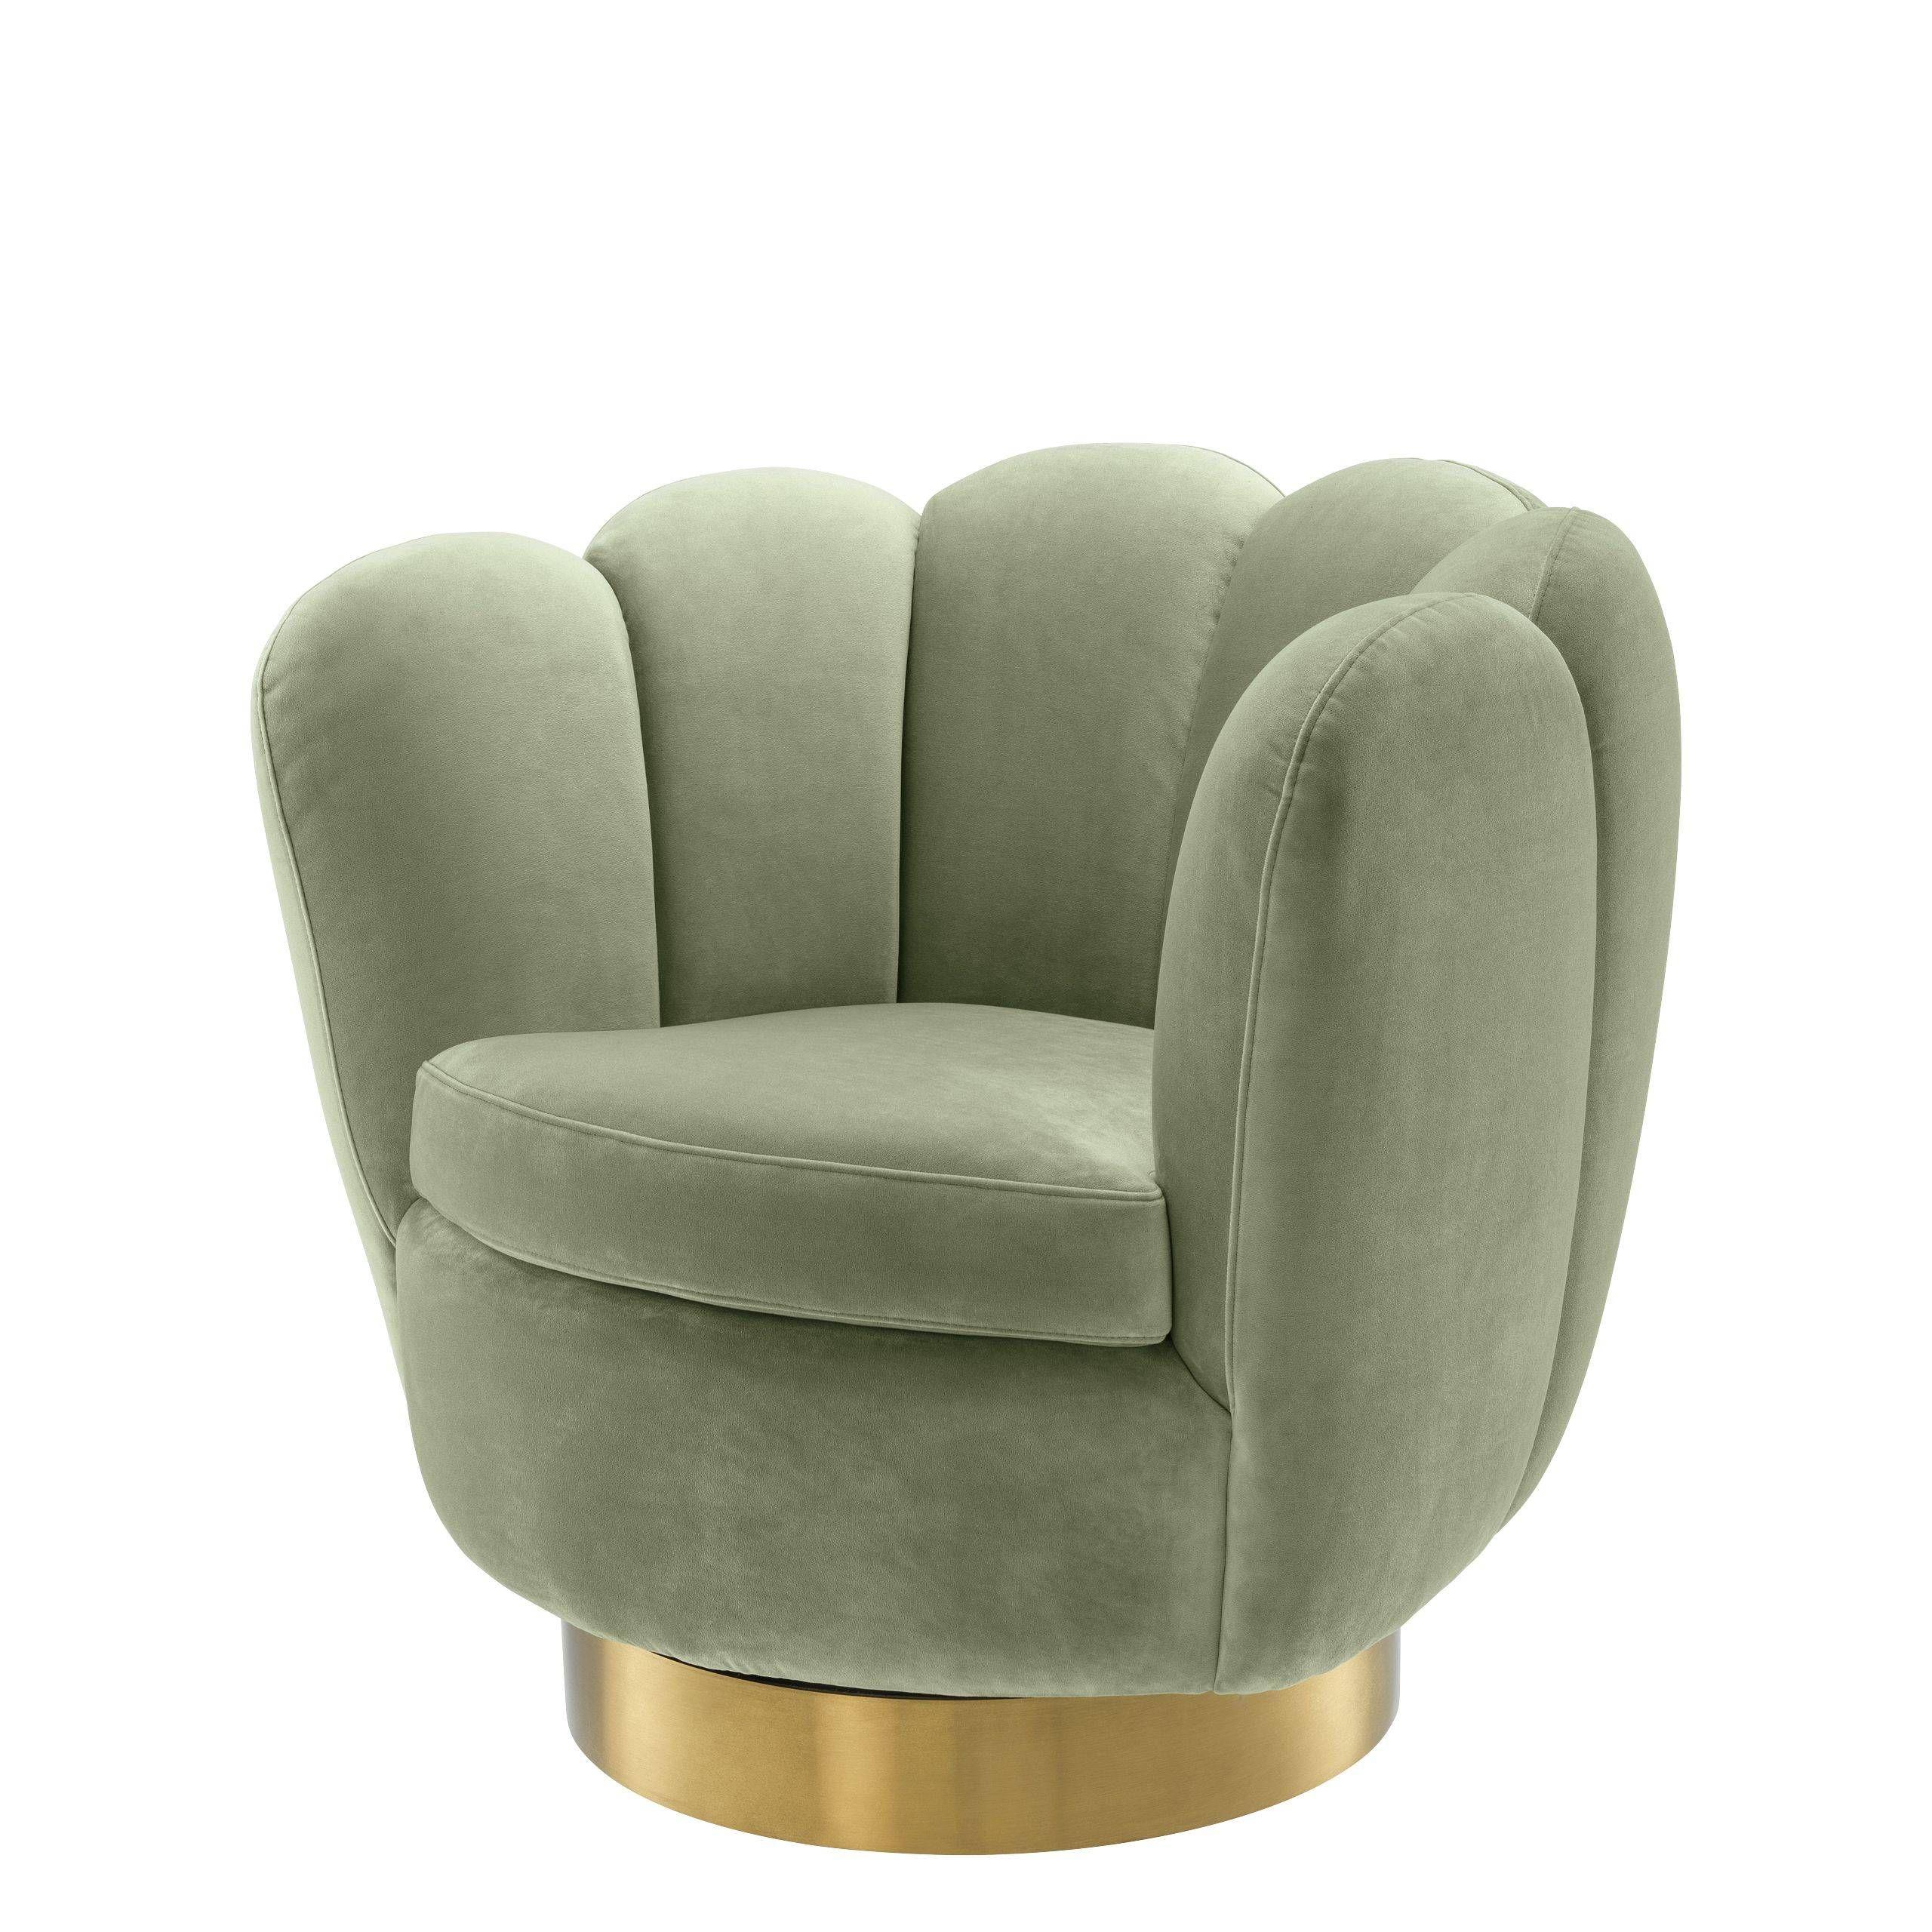 Green Scalloped Swivel Chair Eichholtz Mirage Swivel Barrel Chair Chair Swivel Chair